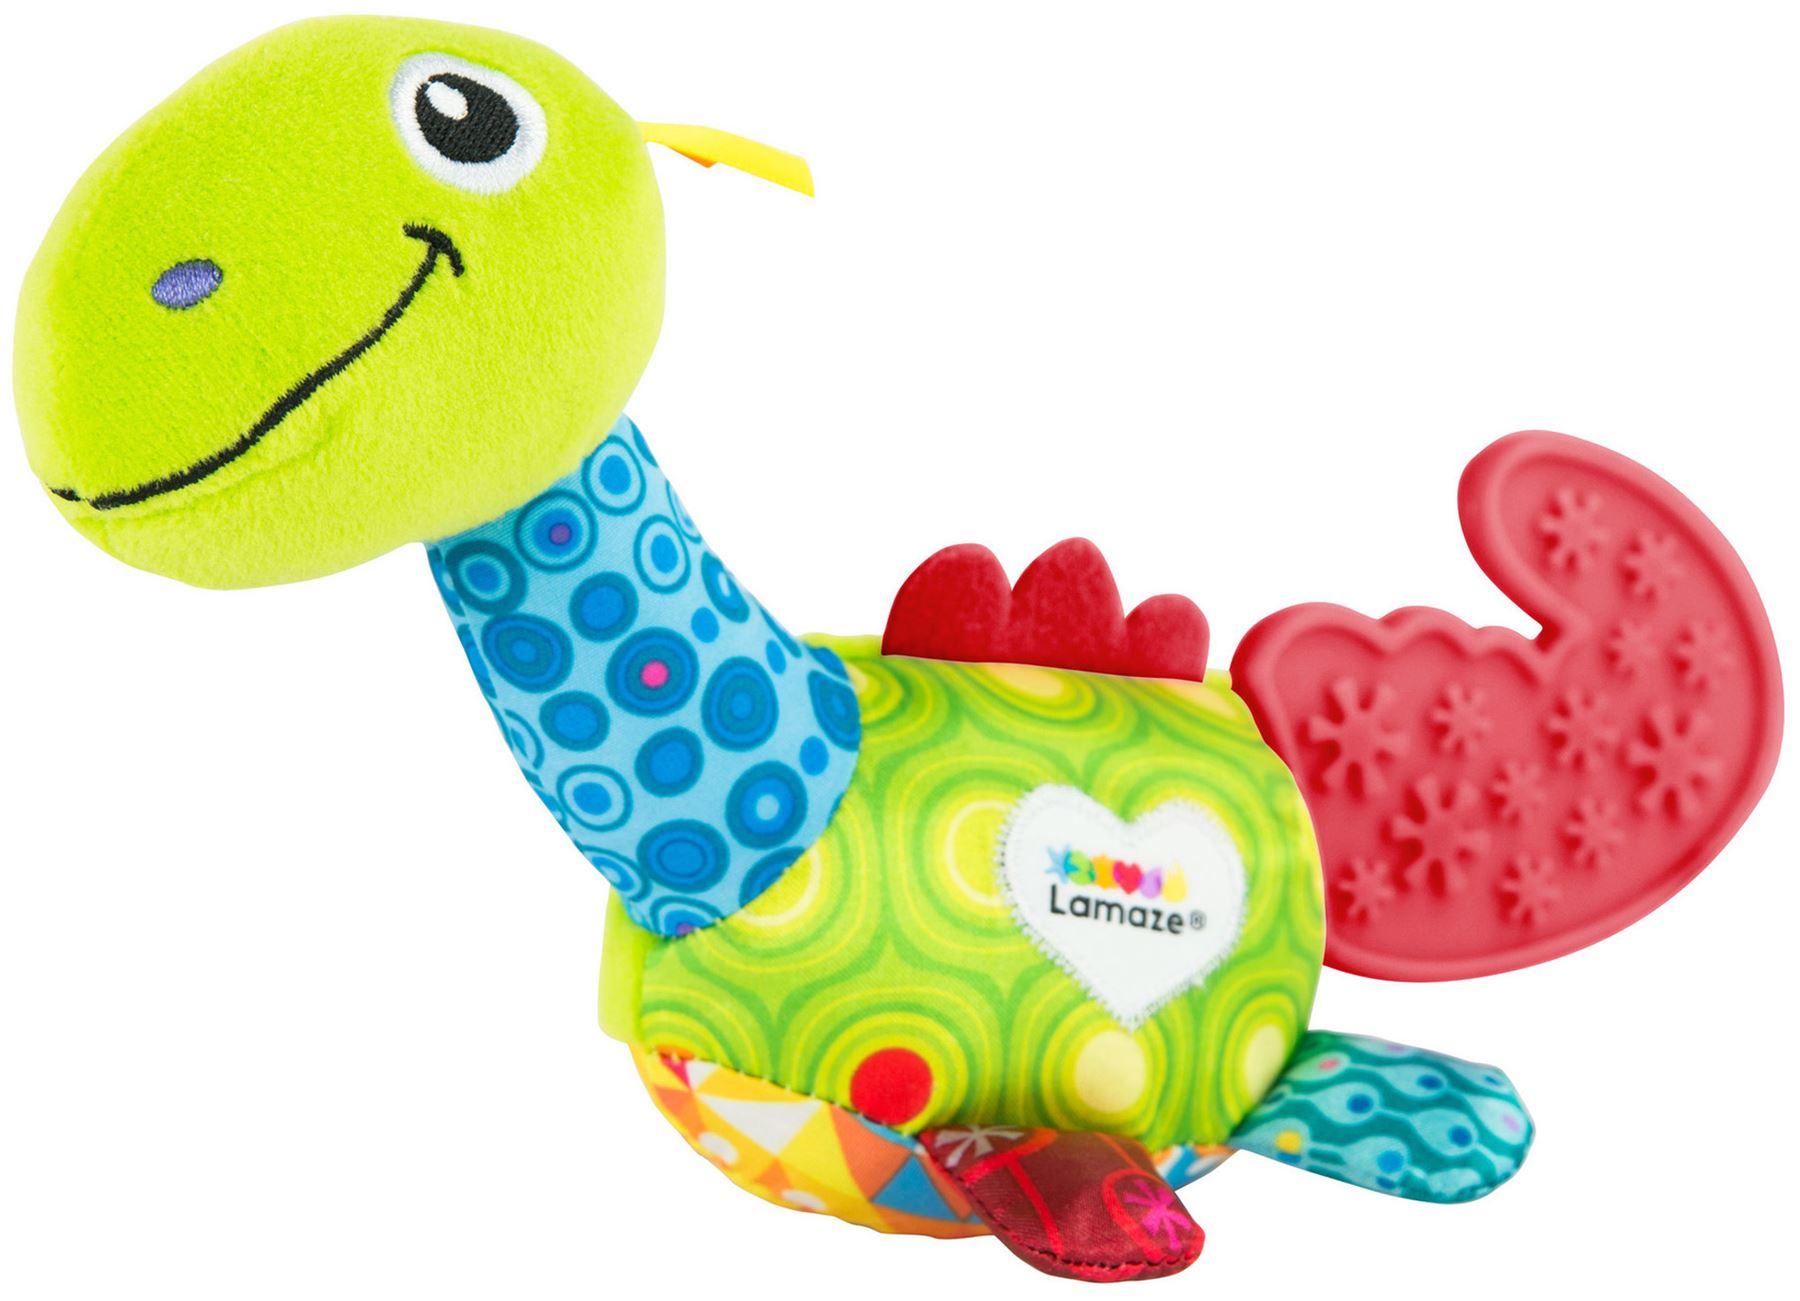 9e46d4cbe6c8 Lamaze MINI DINO TEETHER Baby Developmental Toy BNIP 796714276540